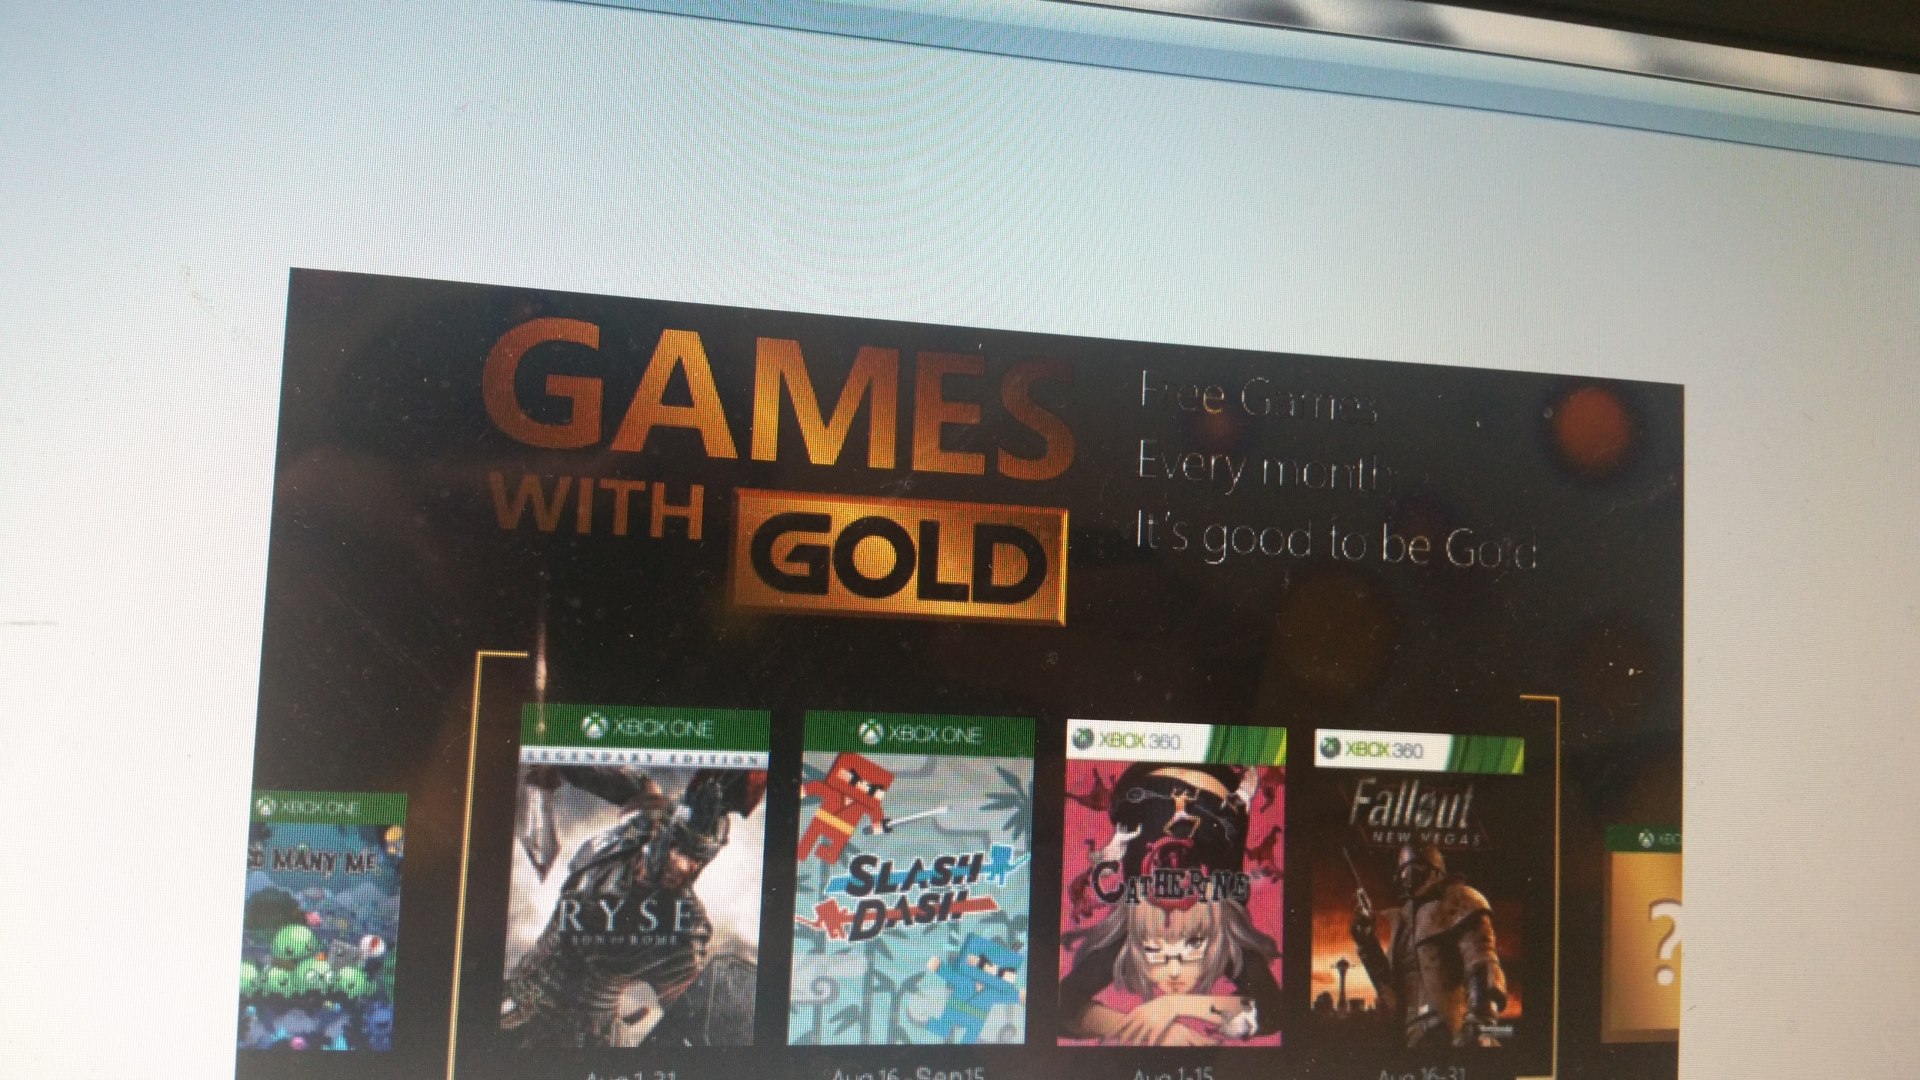 Games with Gold: September 2015 - Thurrott.com